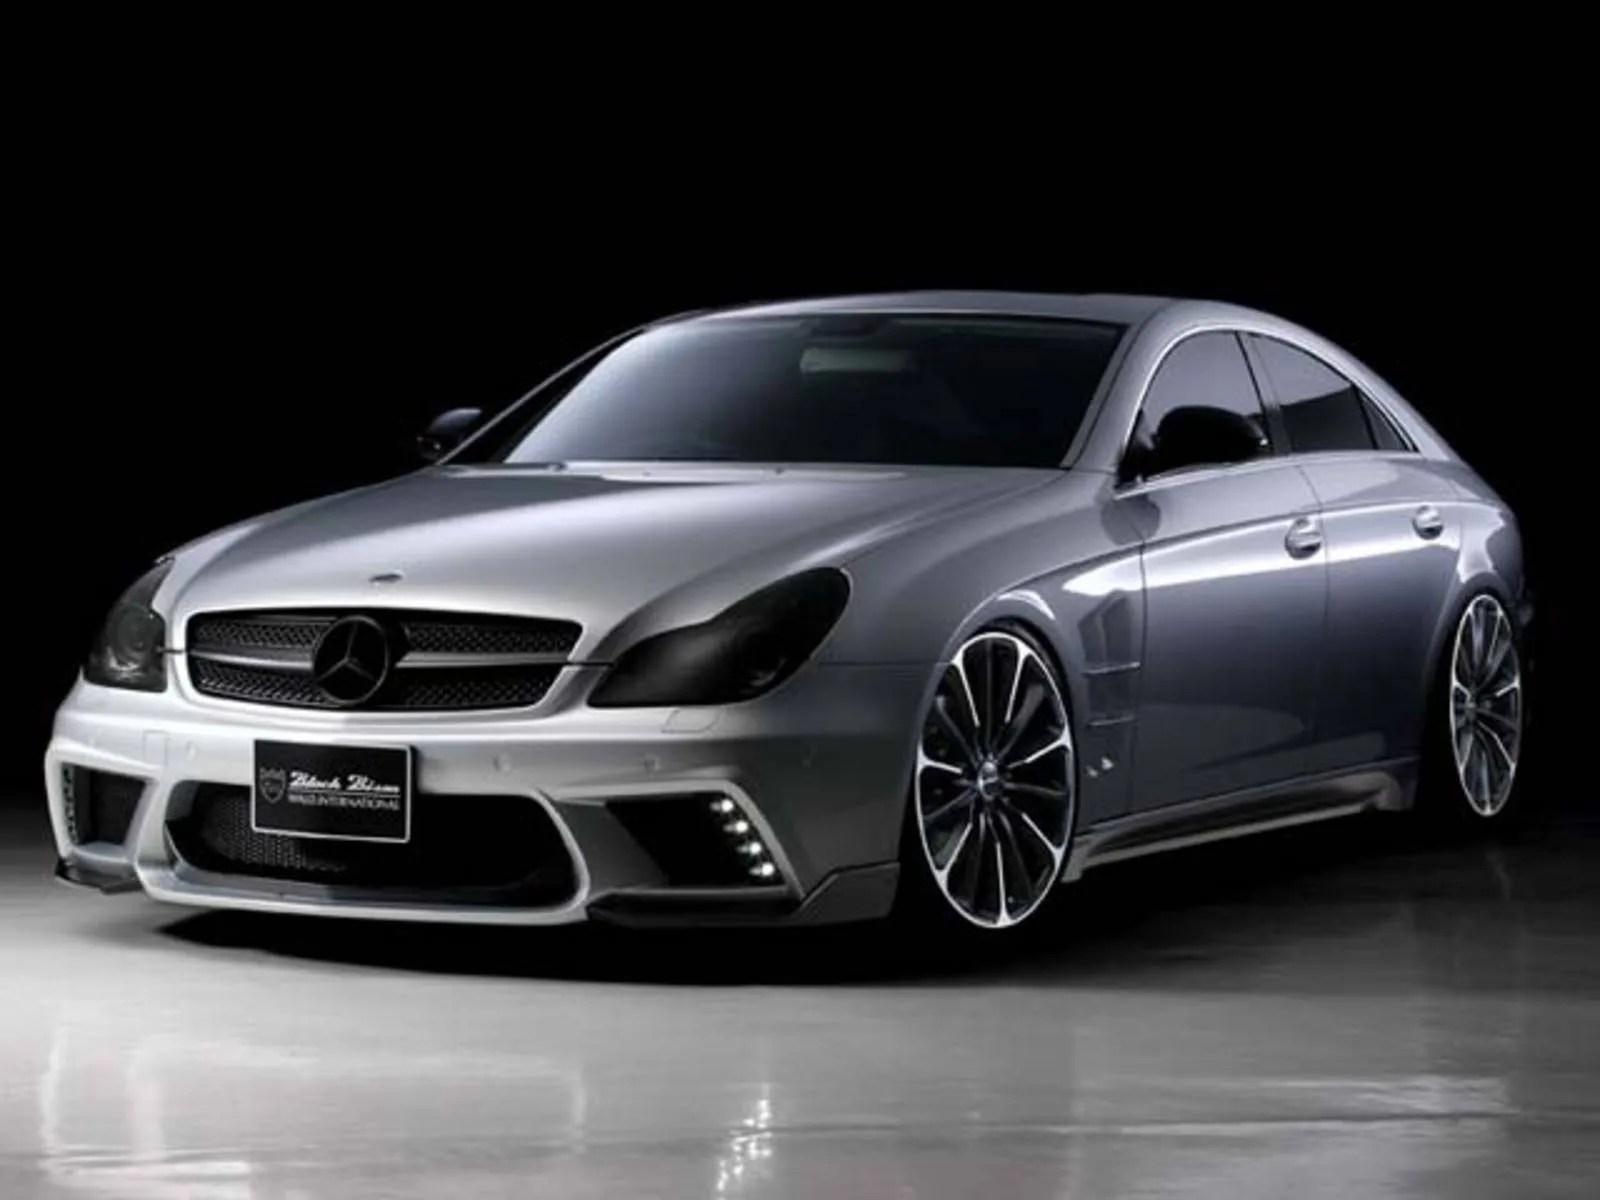 2012 Mercedes CLS Class Black Bison By Wald International